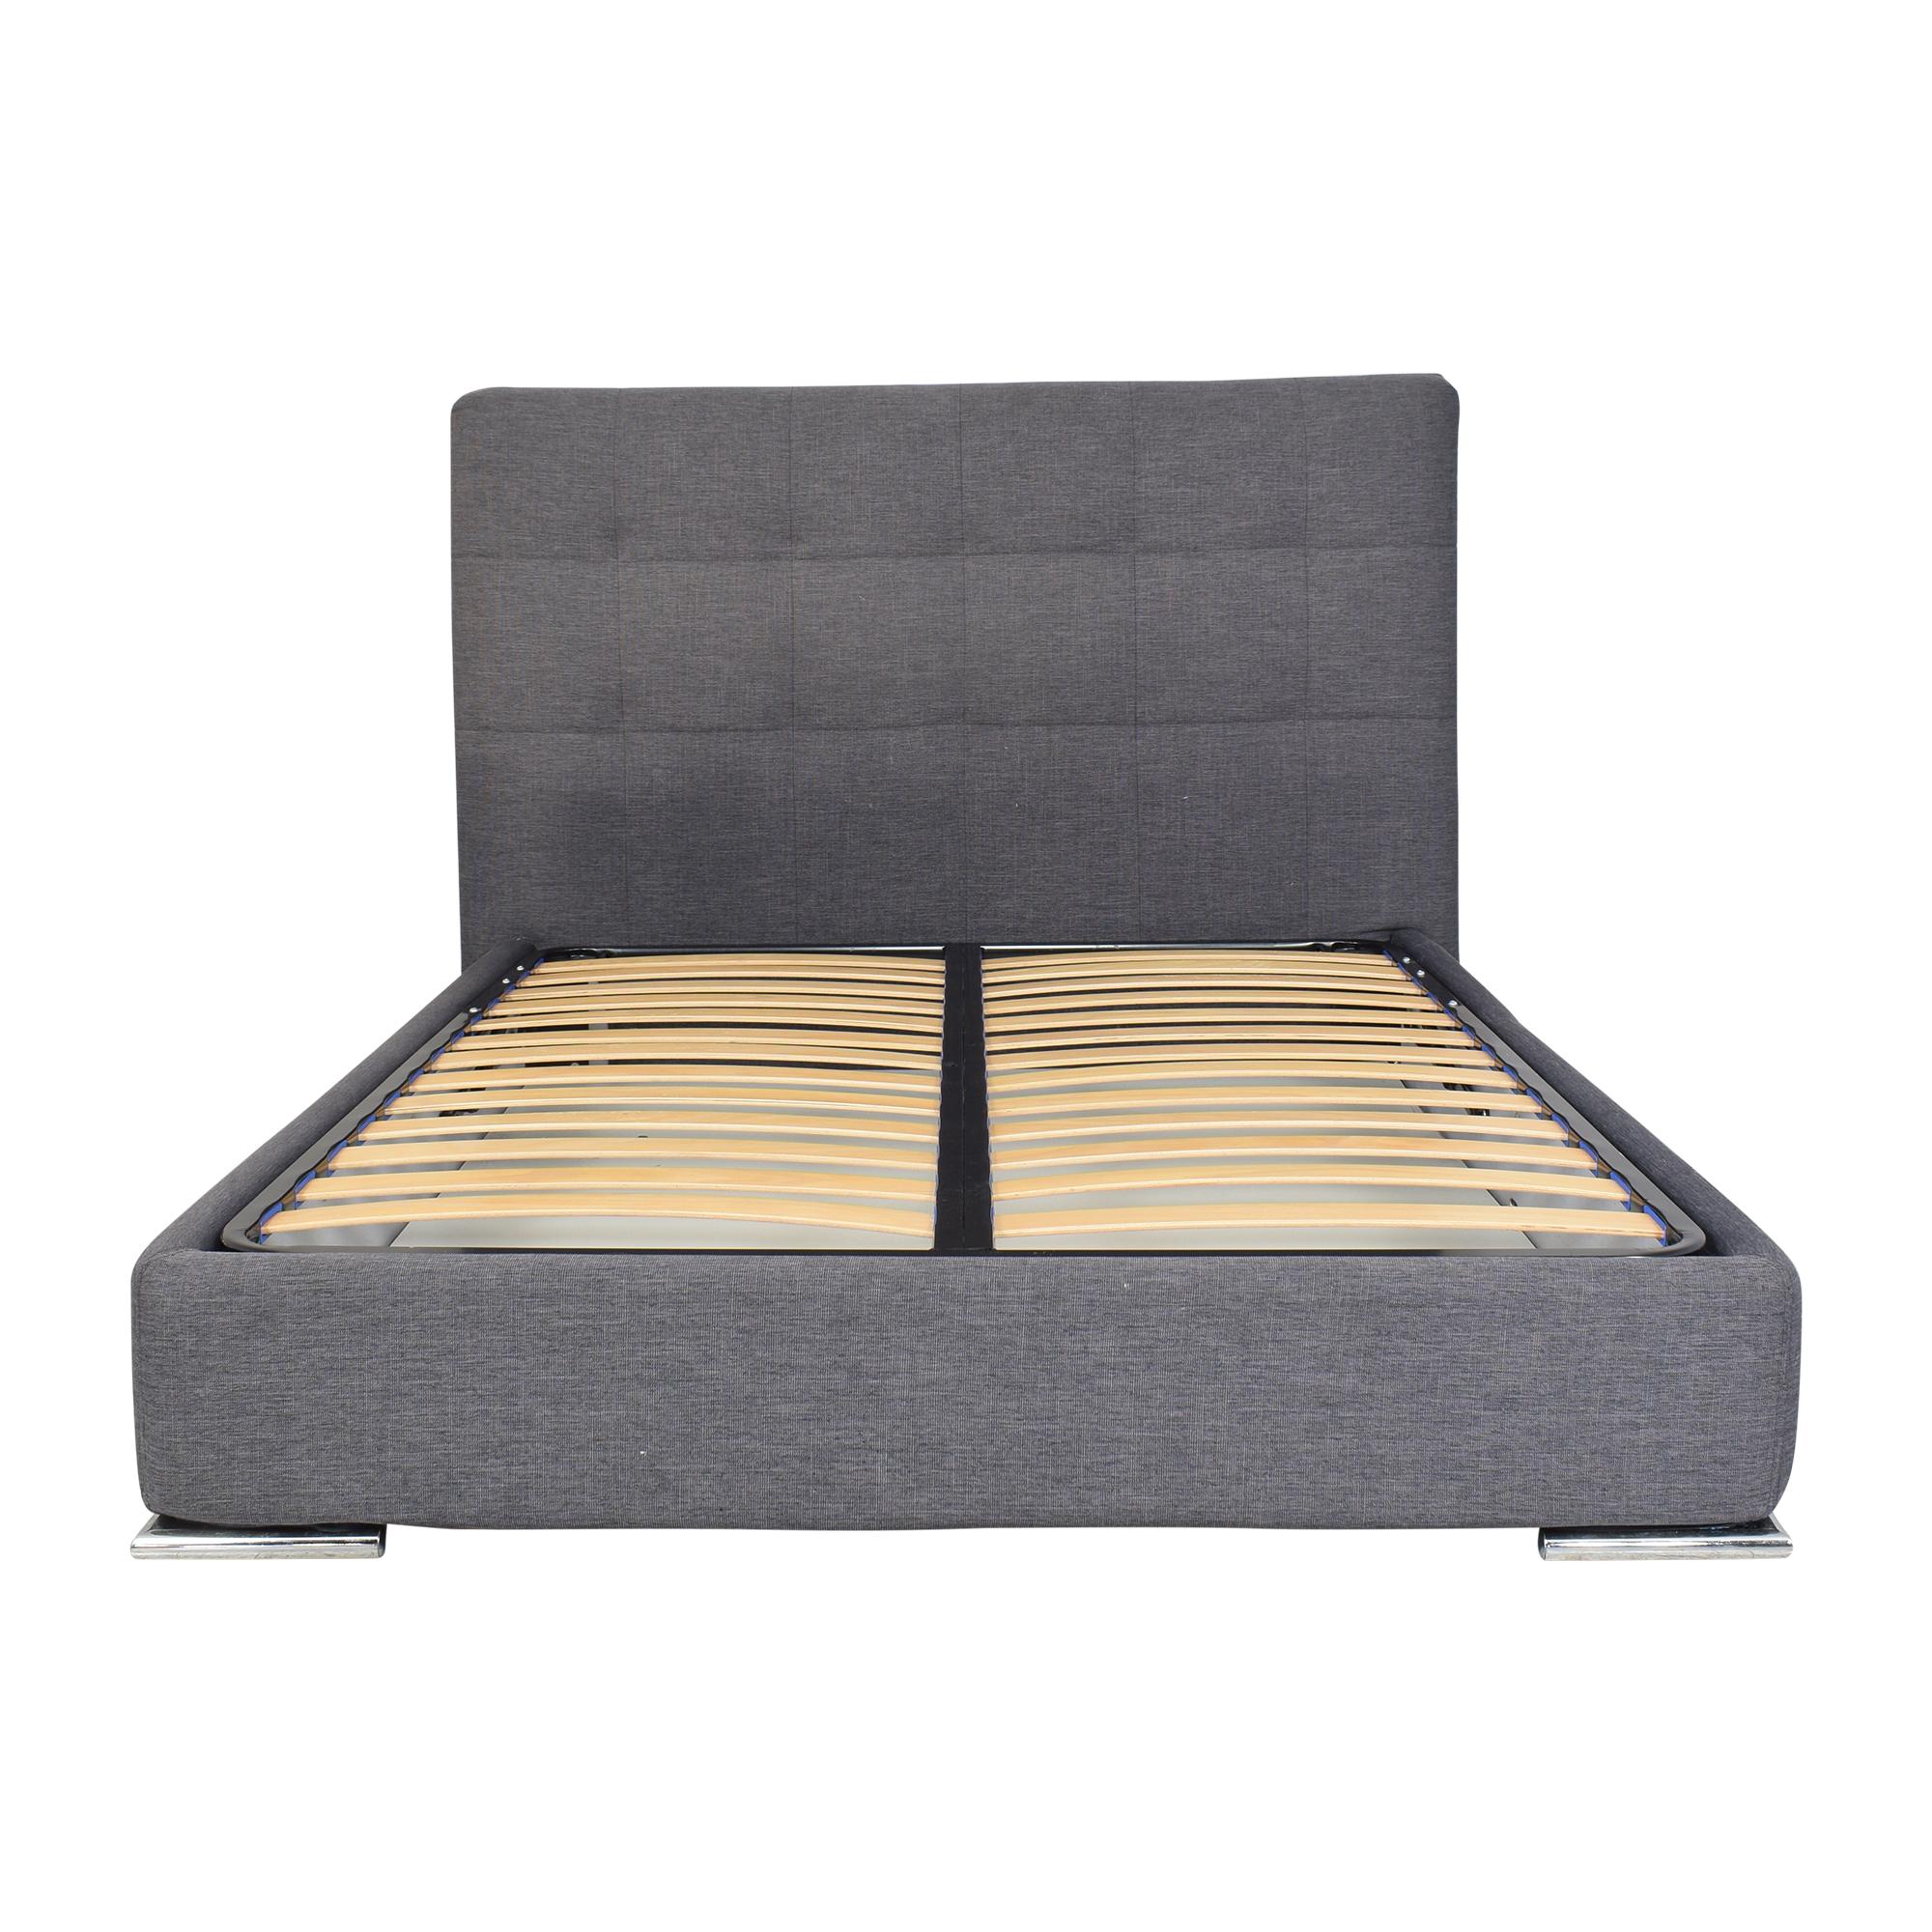 shop Calligaris Calligaris Queen Storage Bed online